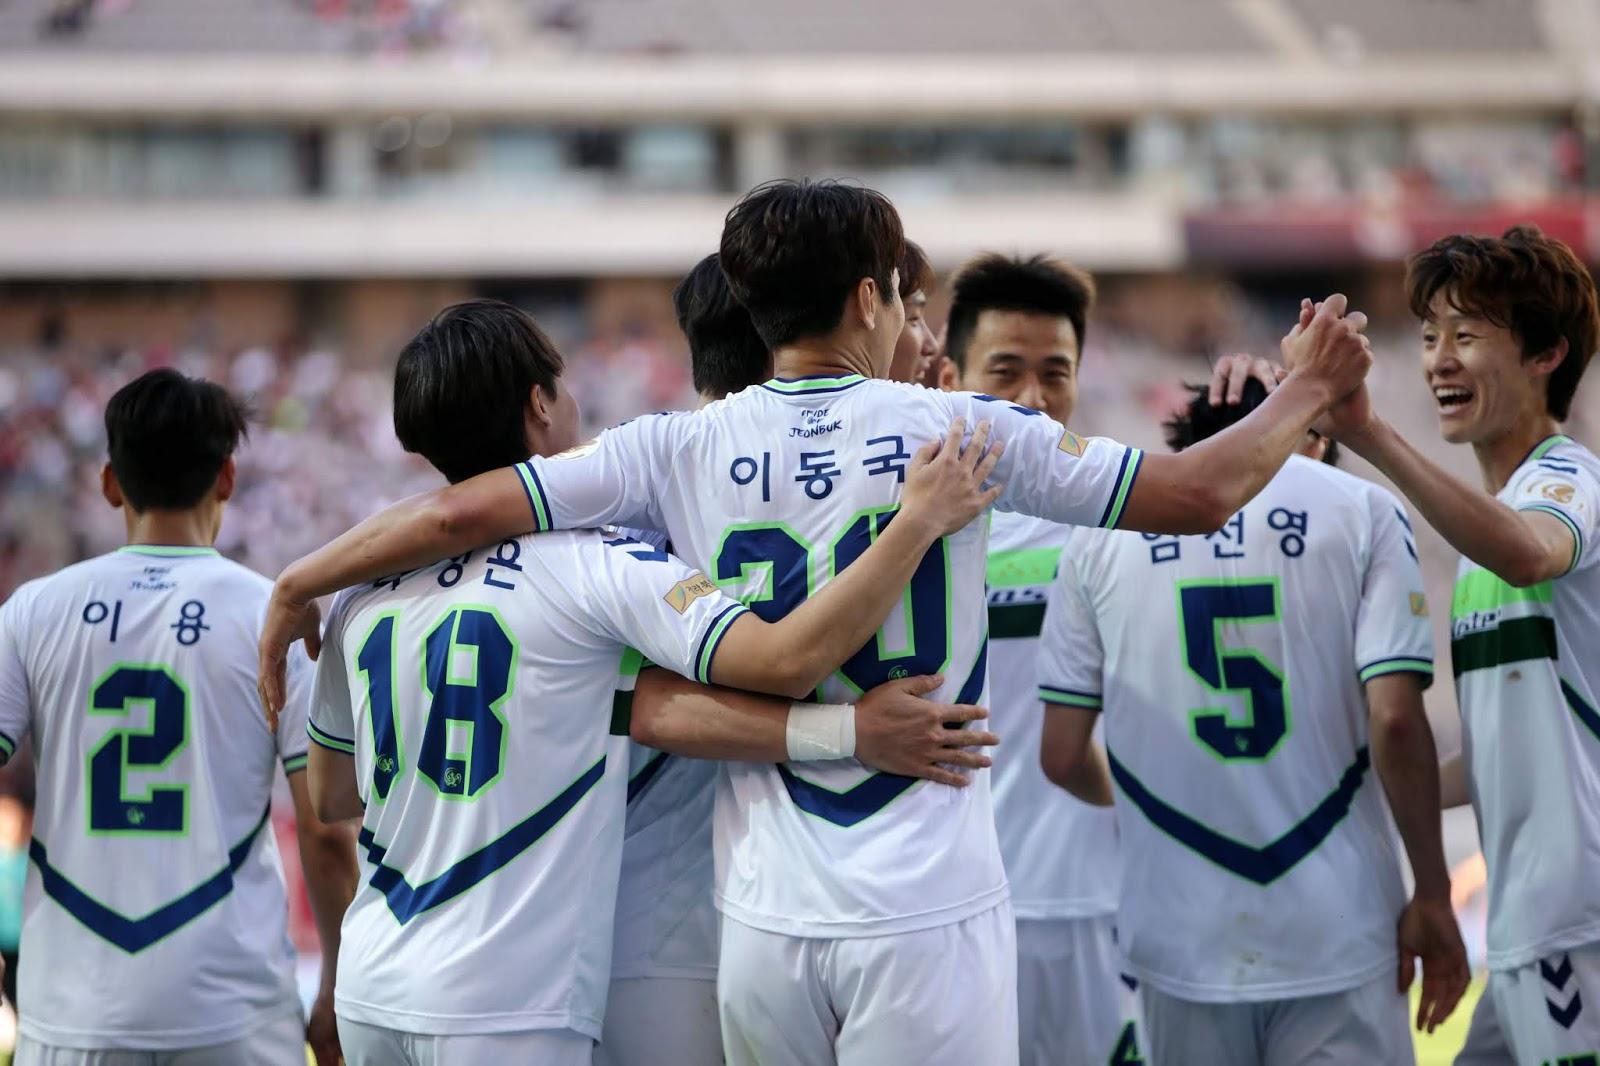 K League 1 Match Preview and Prediction: Jeonbuk Hyundai Motors vs Incheon United